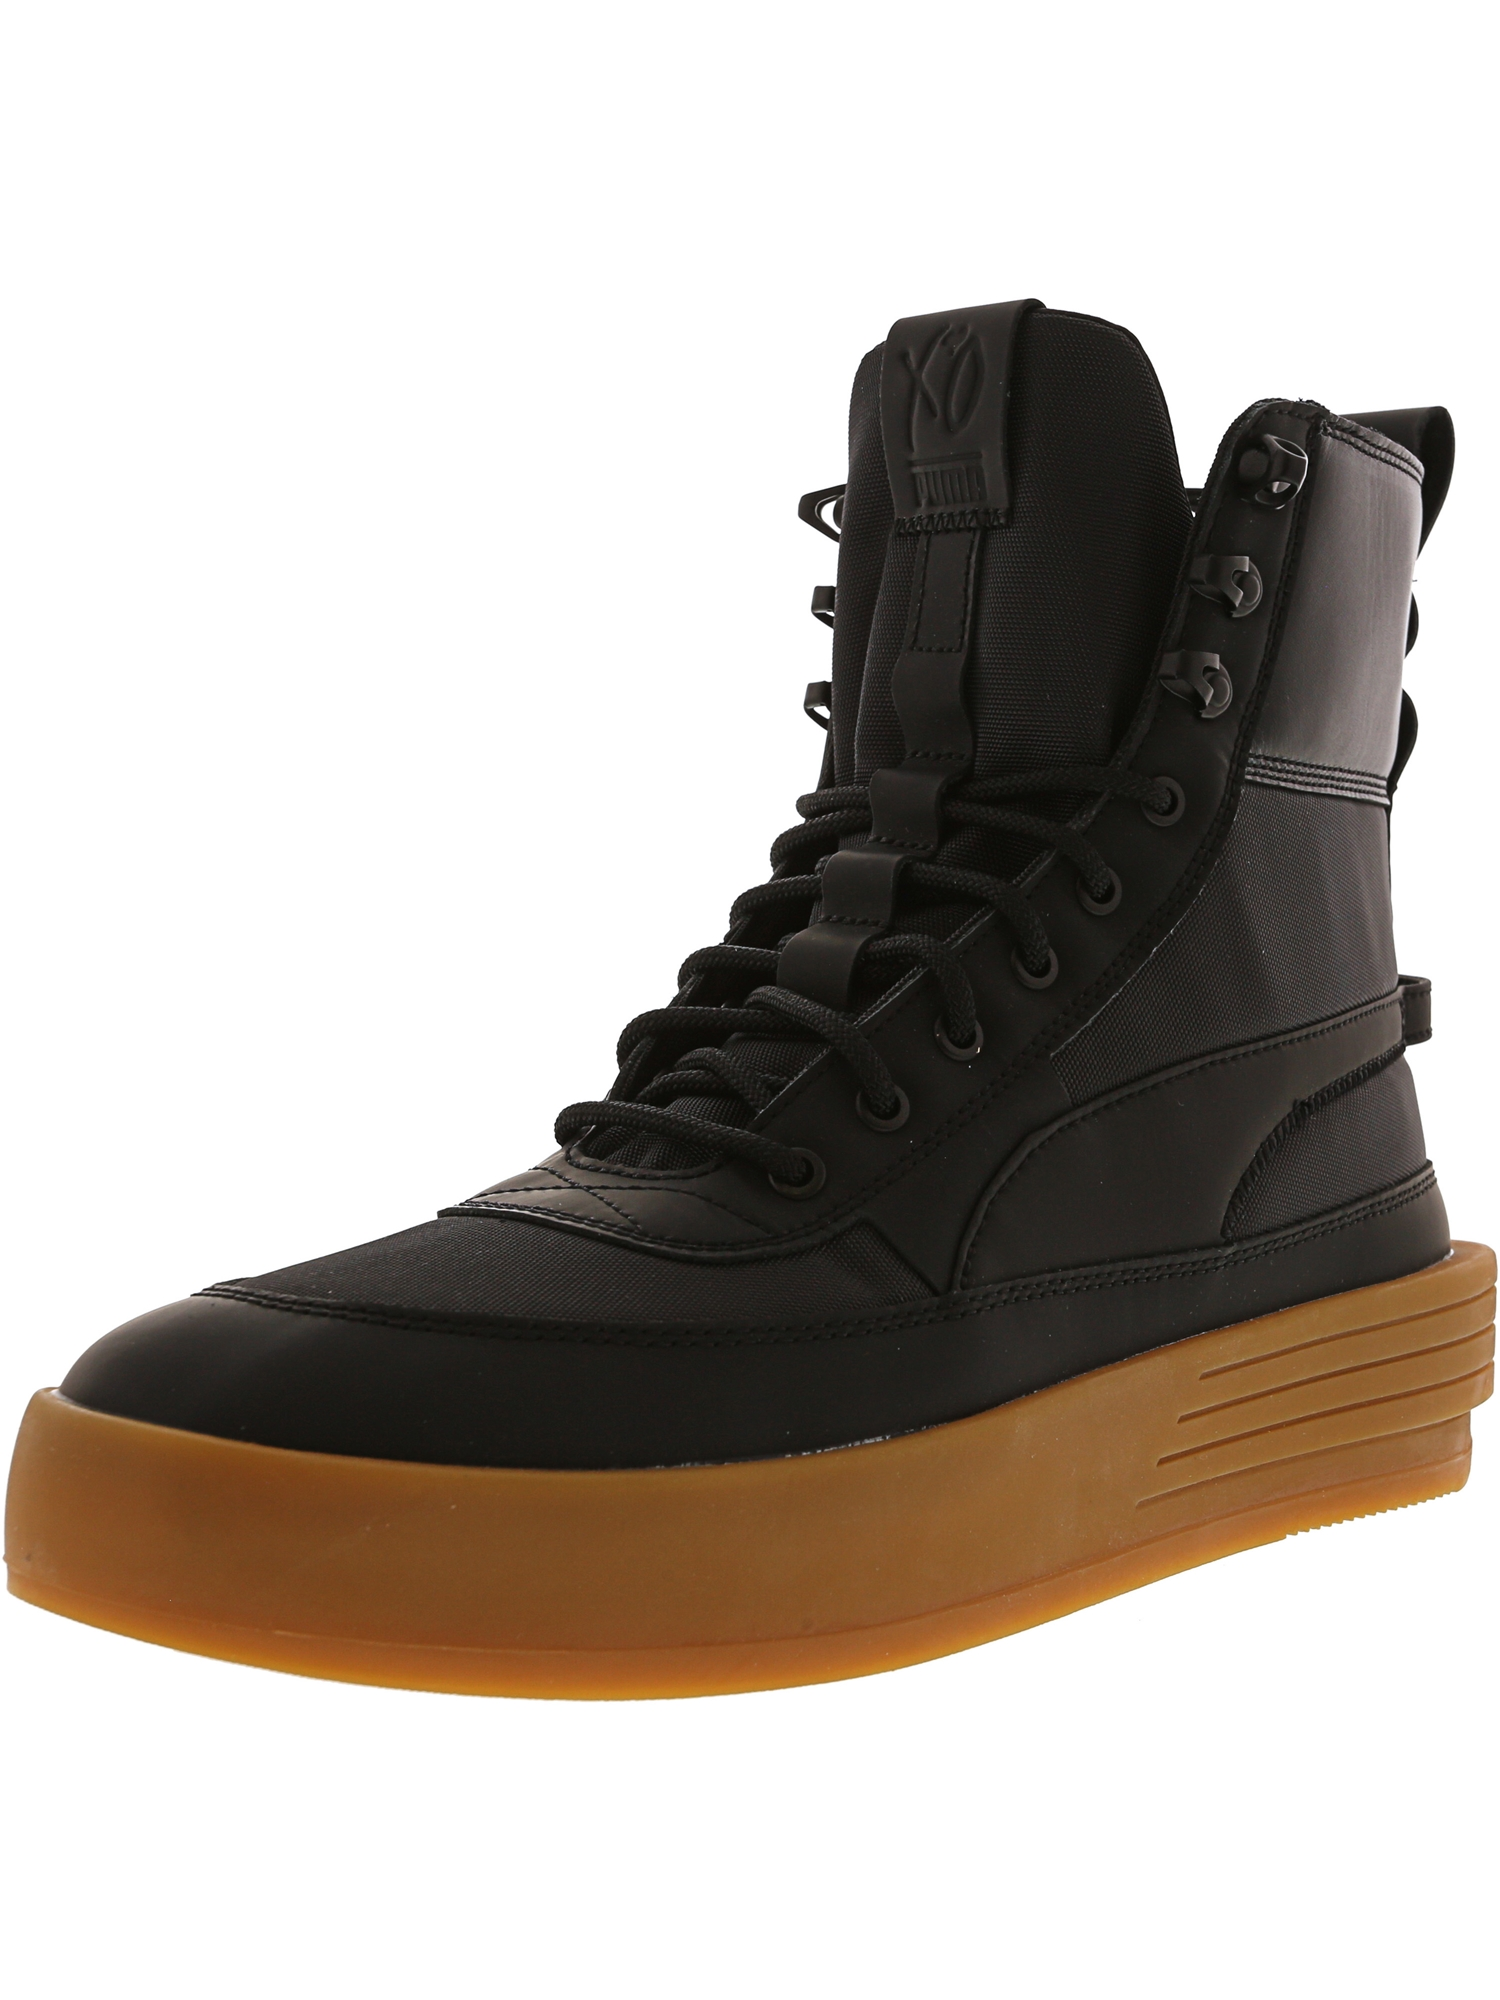 Puma Men's Xo Parallel Tactical Black / High-Top Nylon Fashion Sneaker - 9.5M